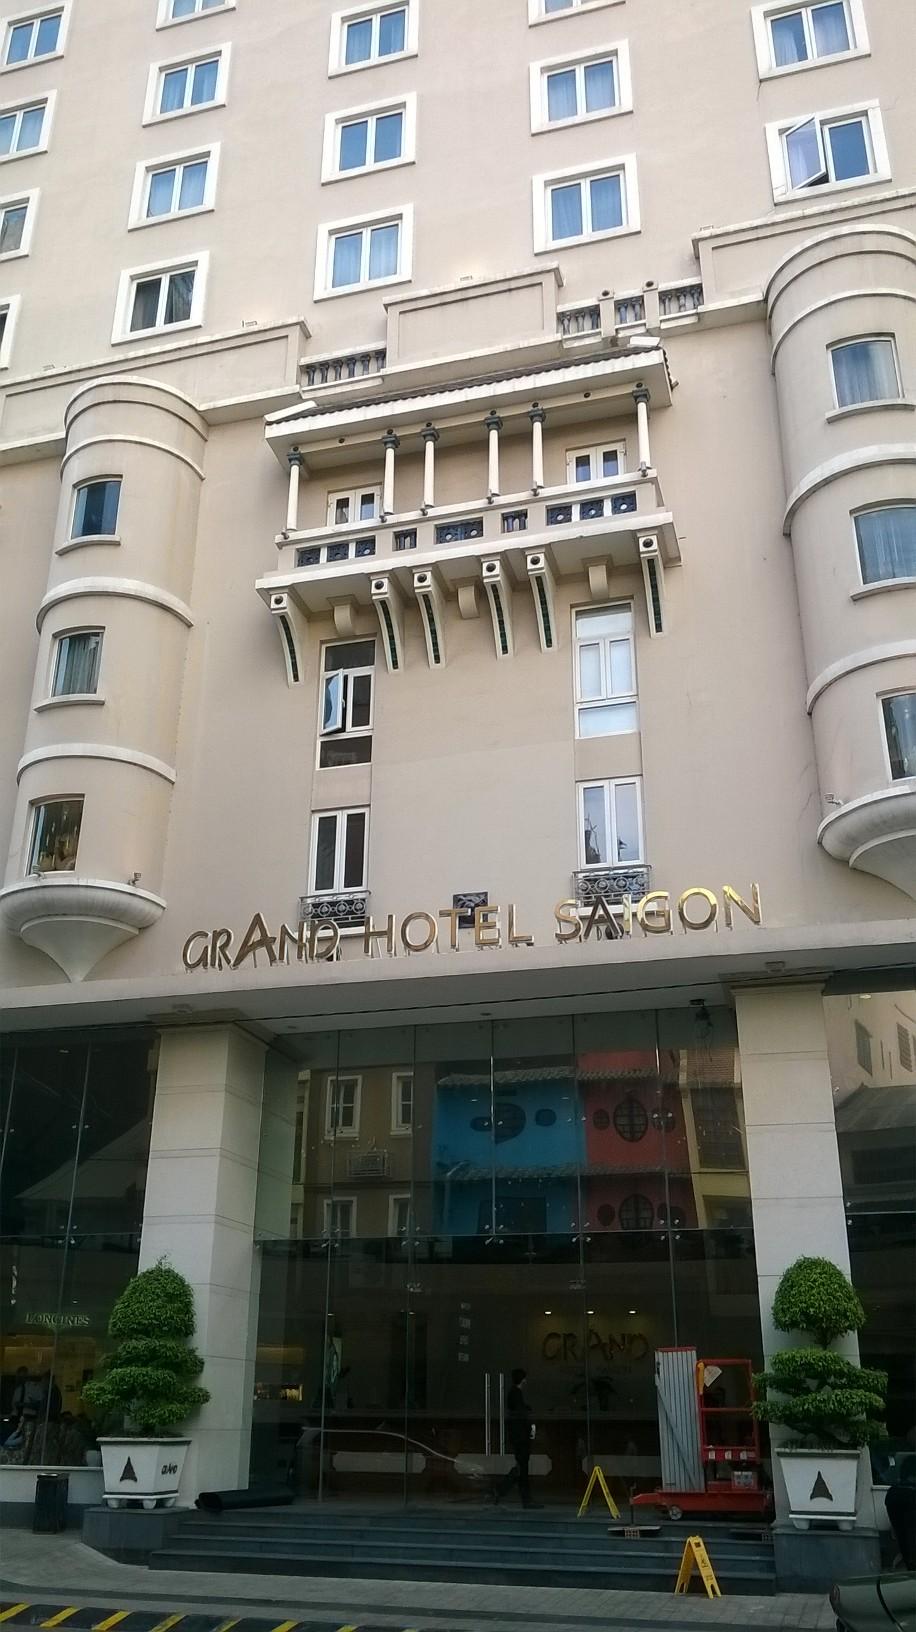 hcmc-grand-hotel-saigon-ent-mar16